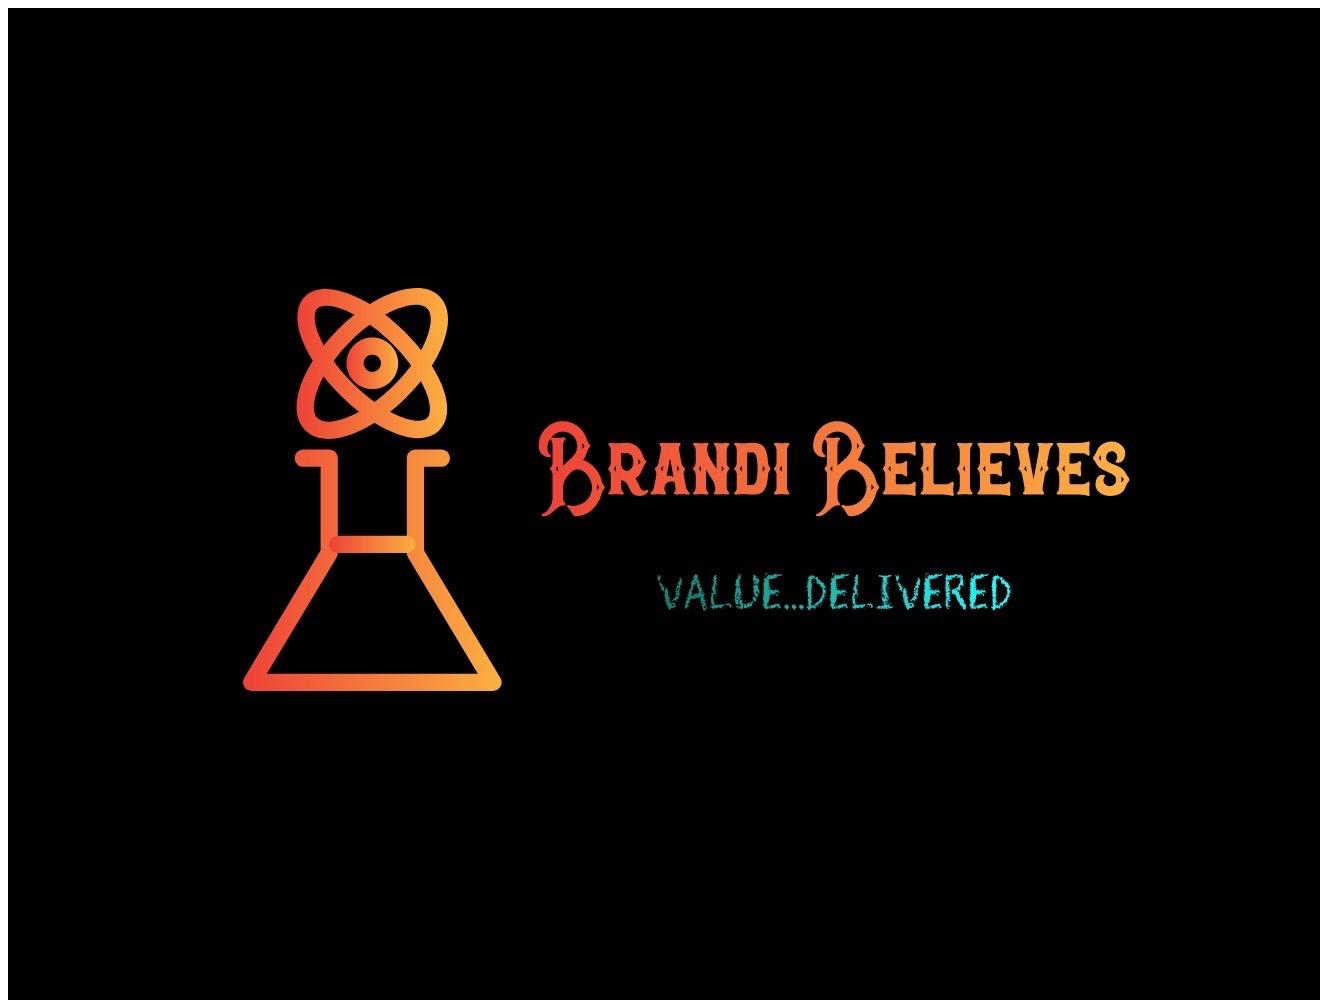 Brandi Believes